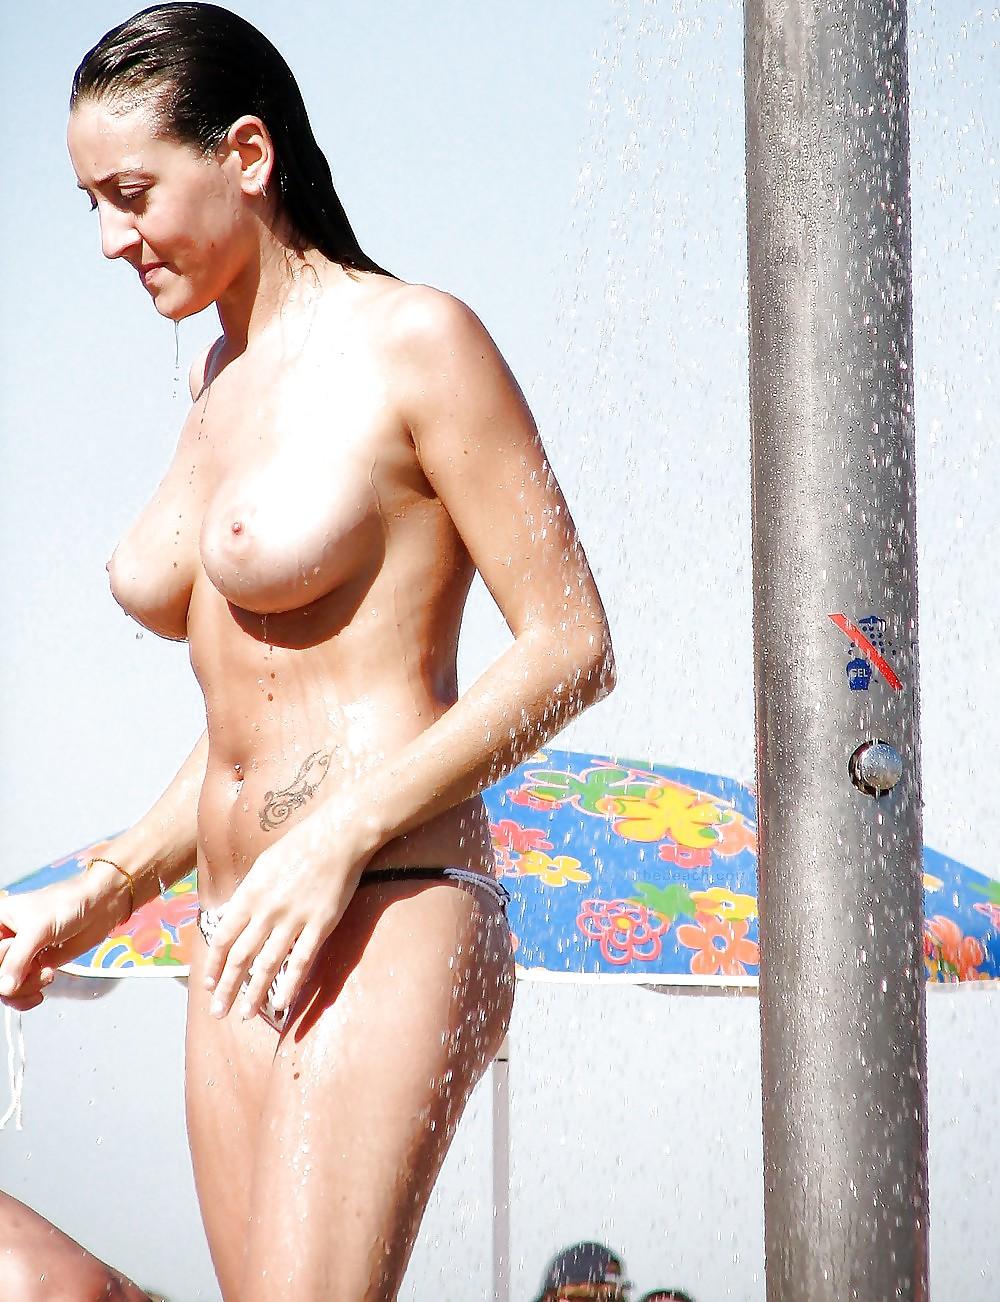 Best tits nude beach-4320